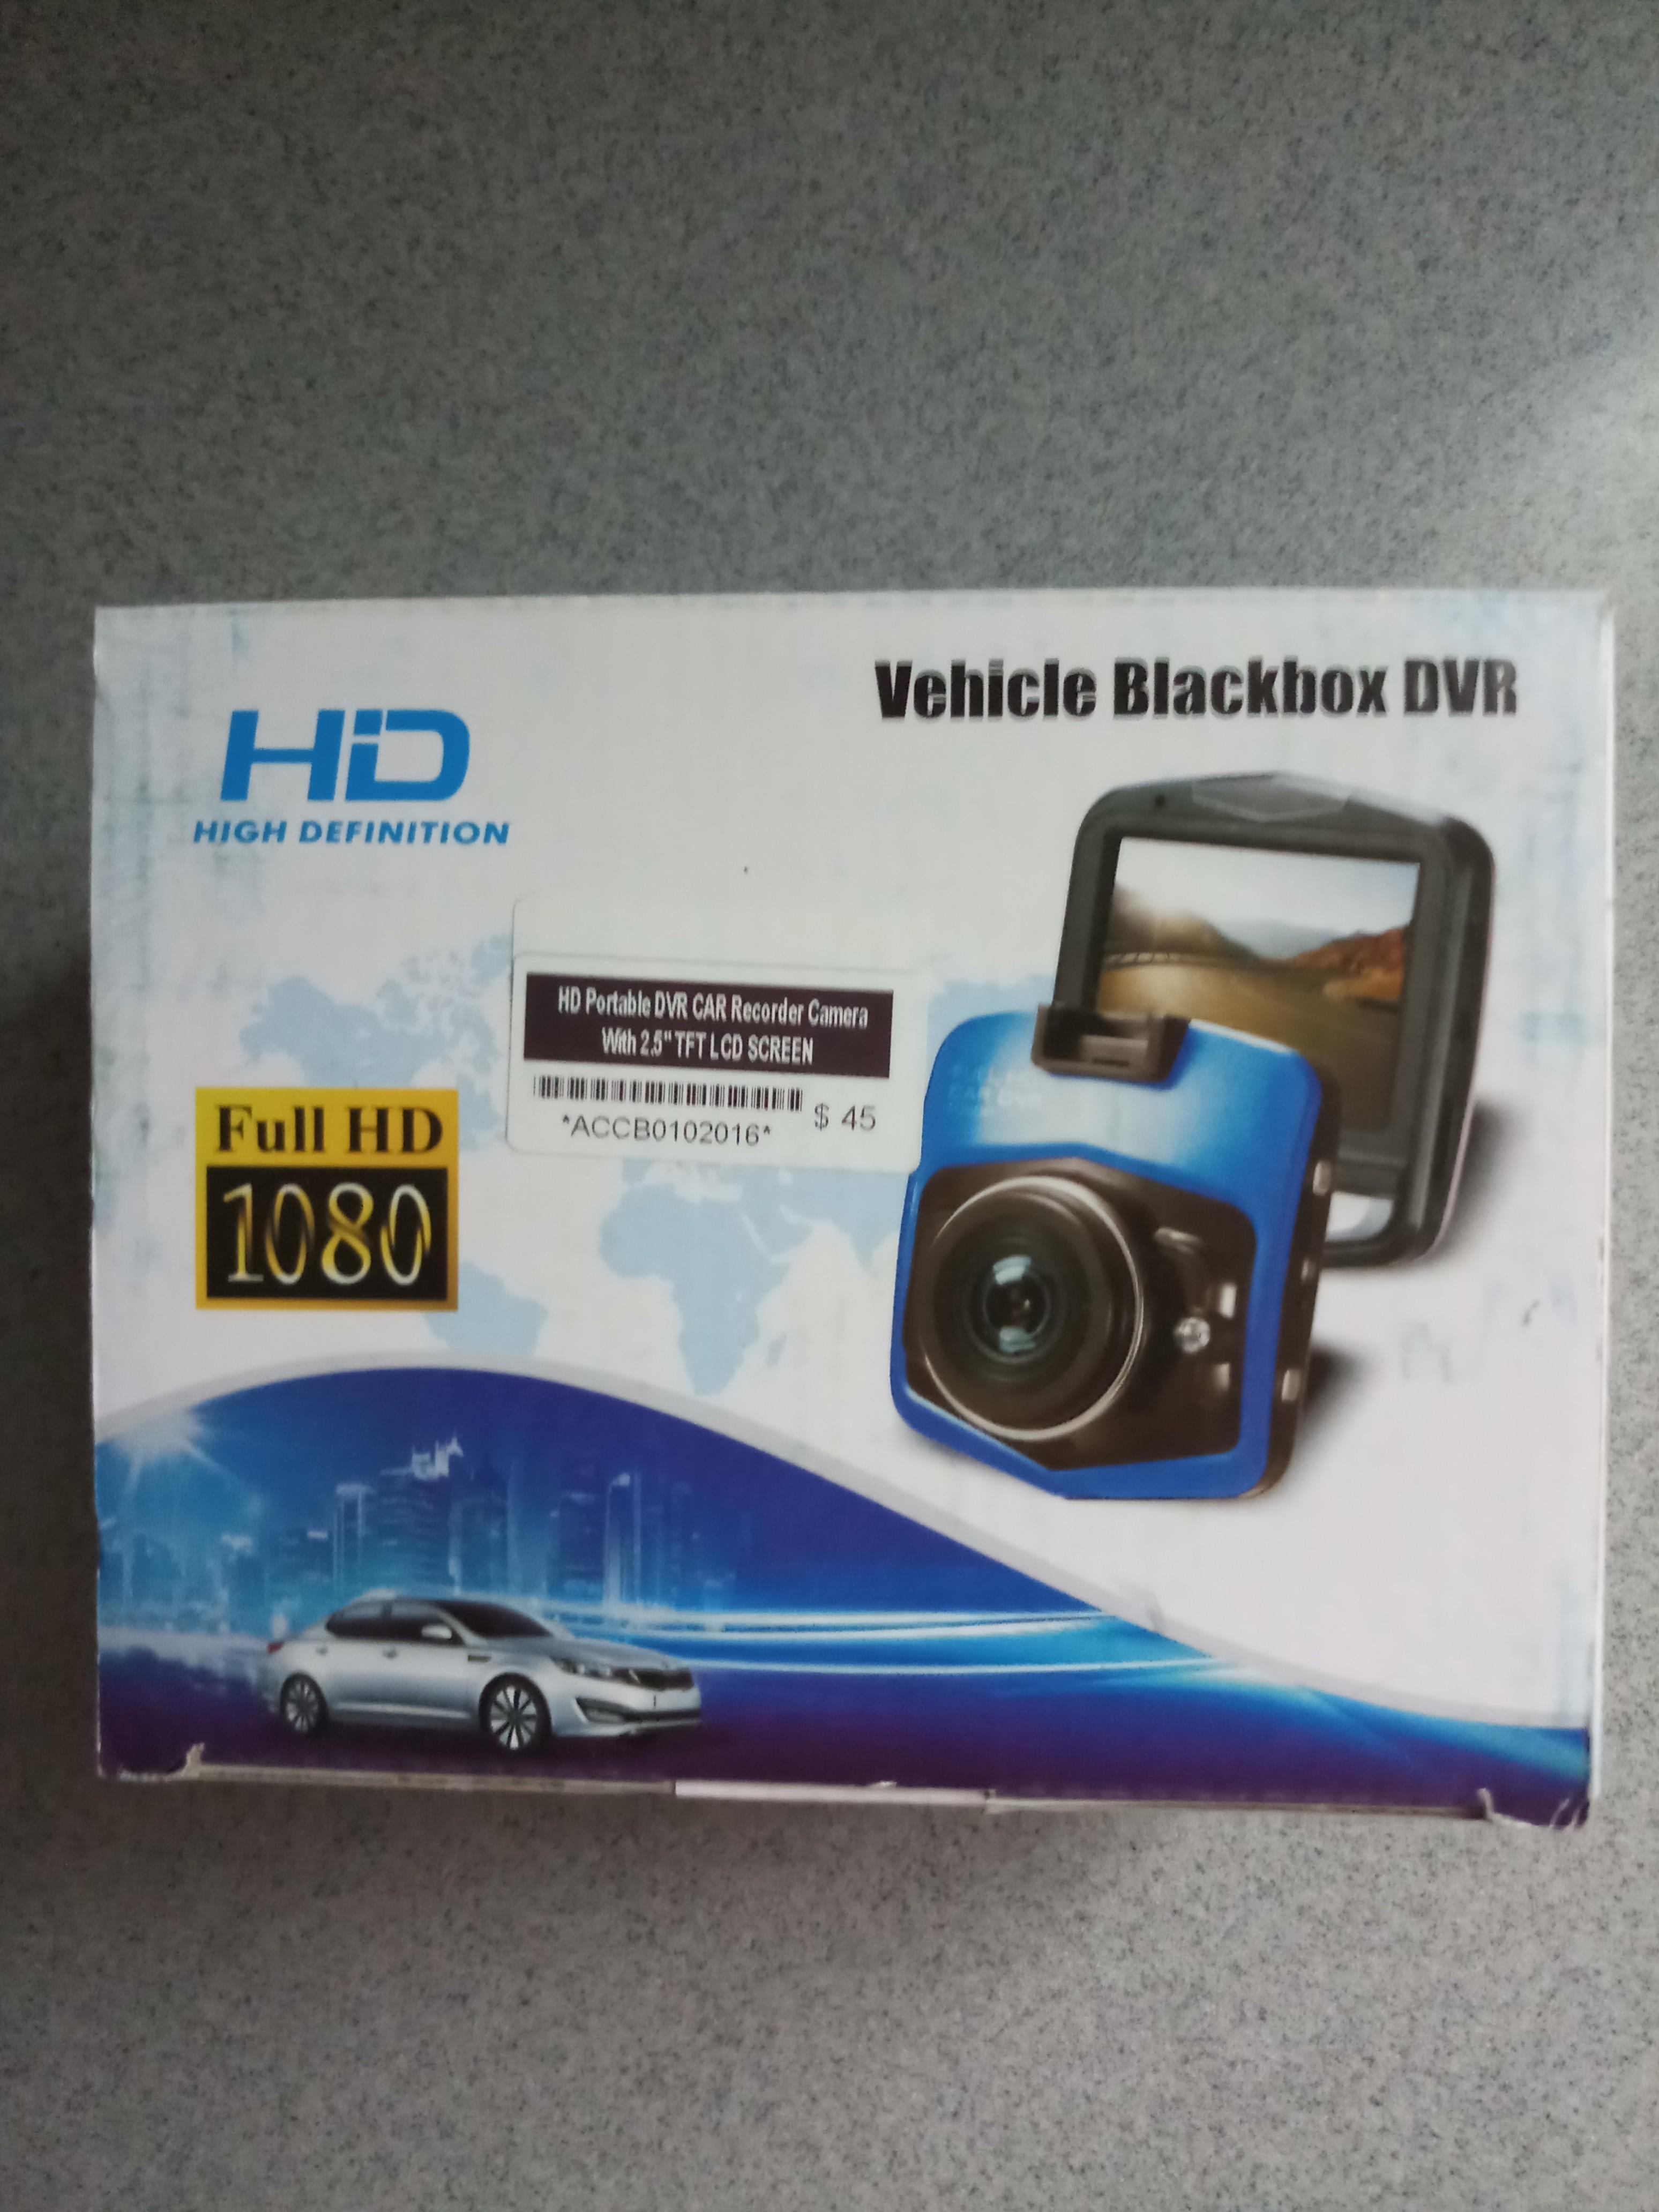 Vehicle Blackbox Dvr Car Video Camera Car Accessories